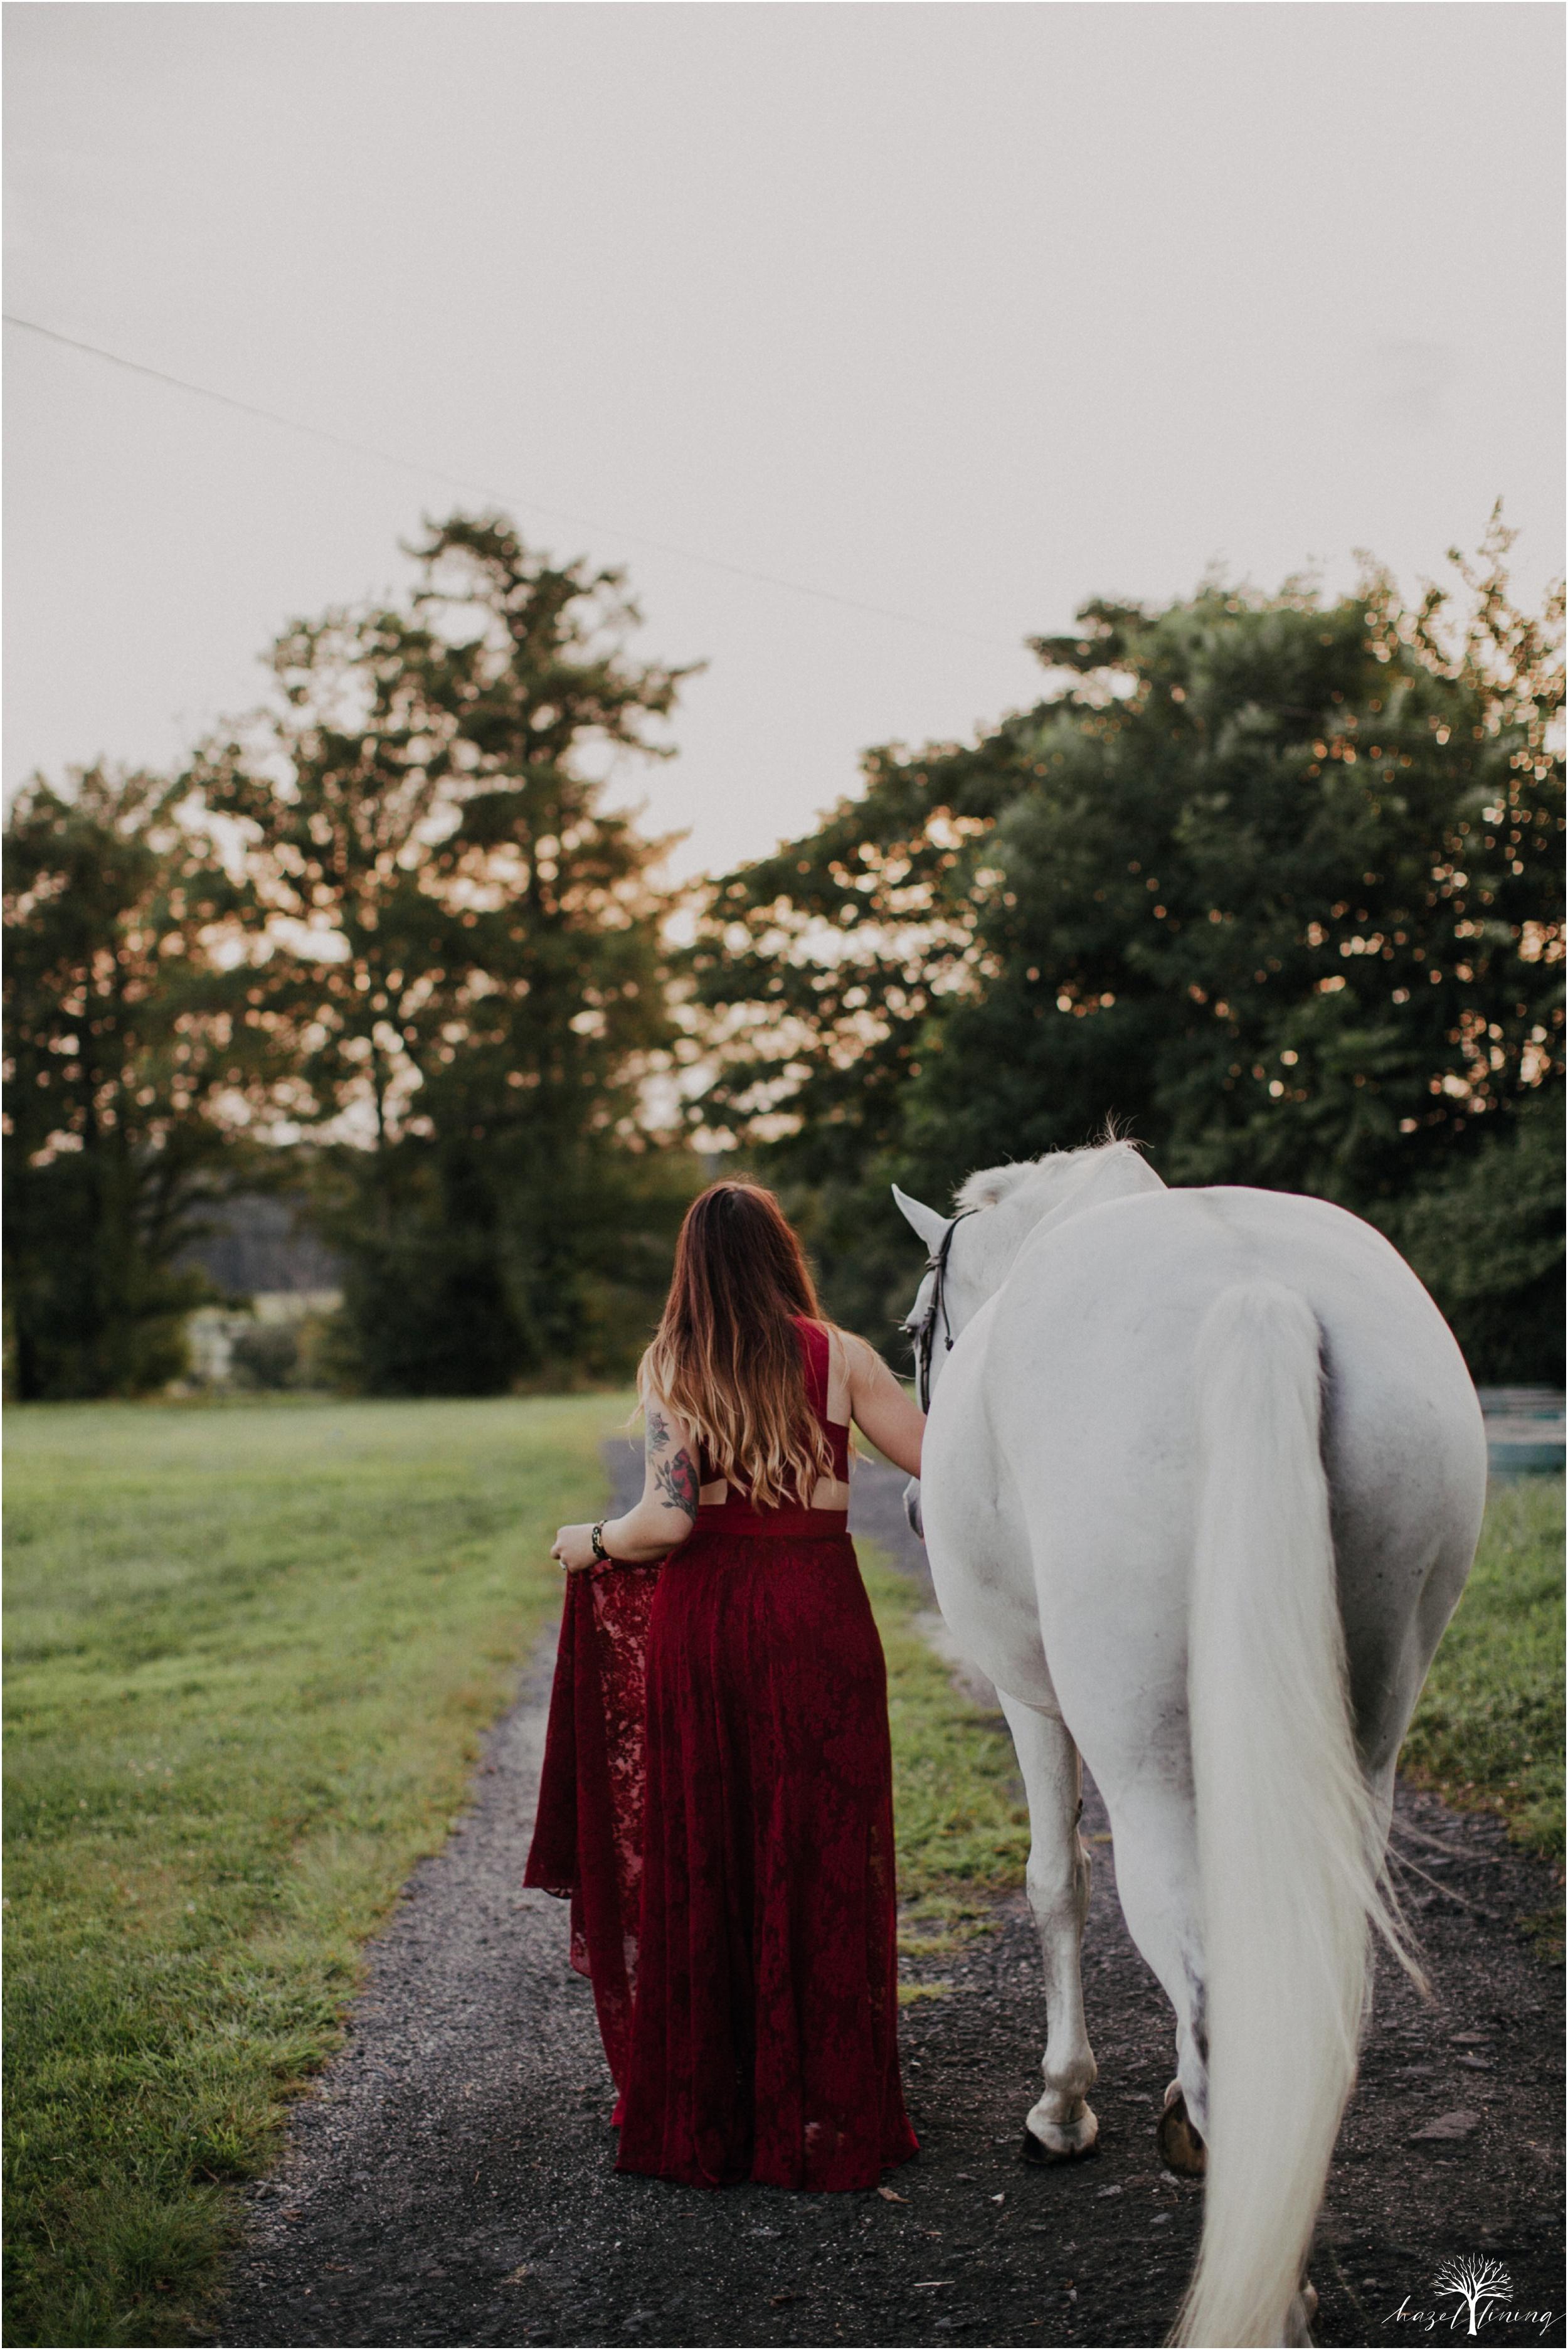 taylor-adams-and-horse-delaware-valley-university-delval-summer-equestrian-portrait-session-hazel-lining-photography-destination-elopement-wedding-engagement-photography_0057.jpg